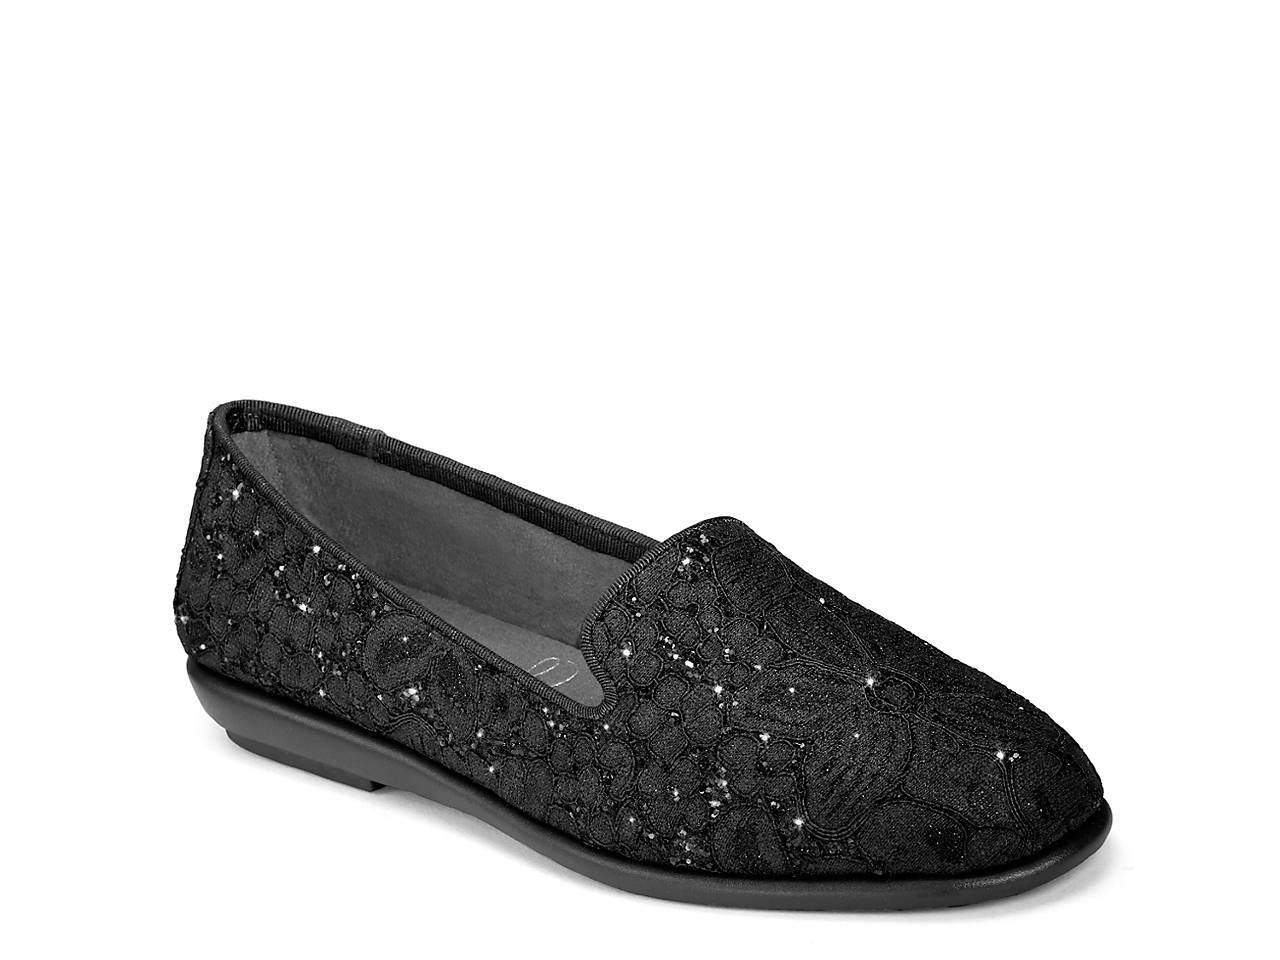 2f96d002da8 Aerosoles Betunia Loafer Women s Shoes